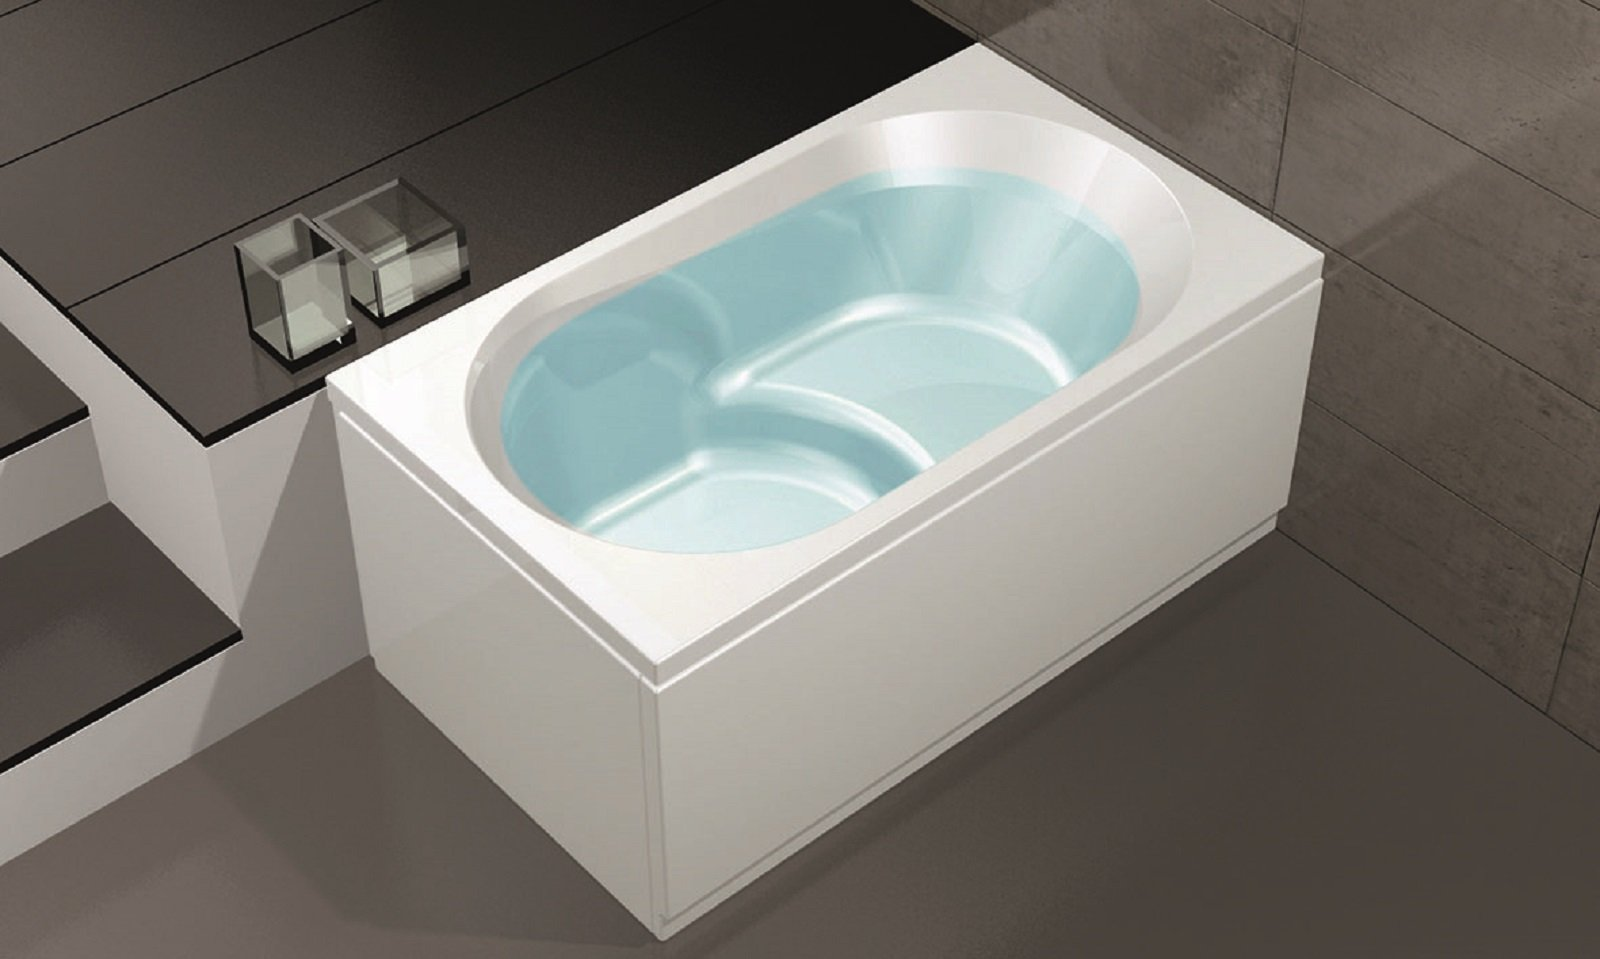 Vasca da bagno piccola dimensioni mobili bagno di piccole - Misure vasca da bagno piccola ...